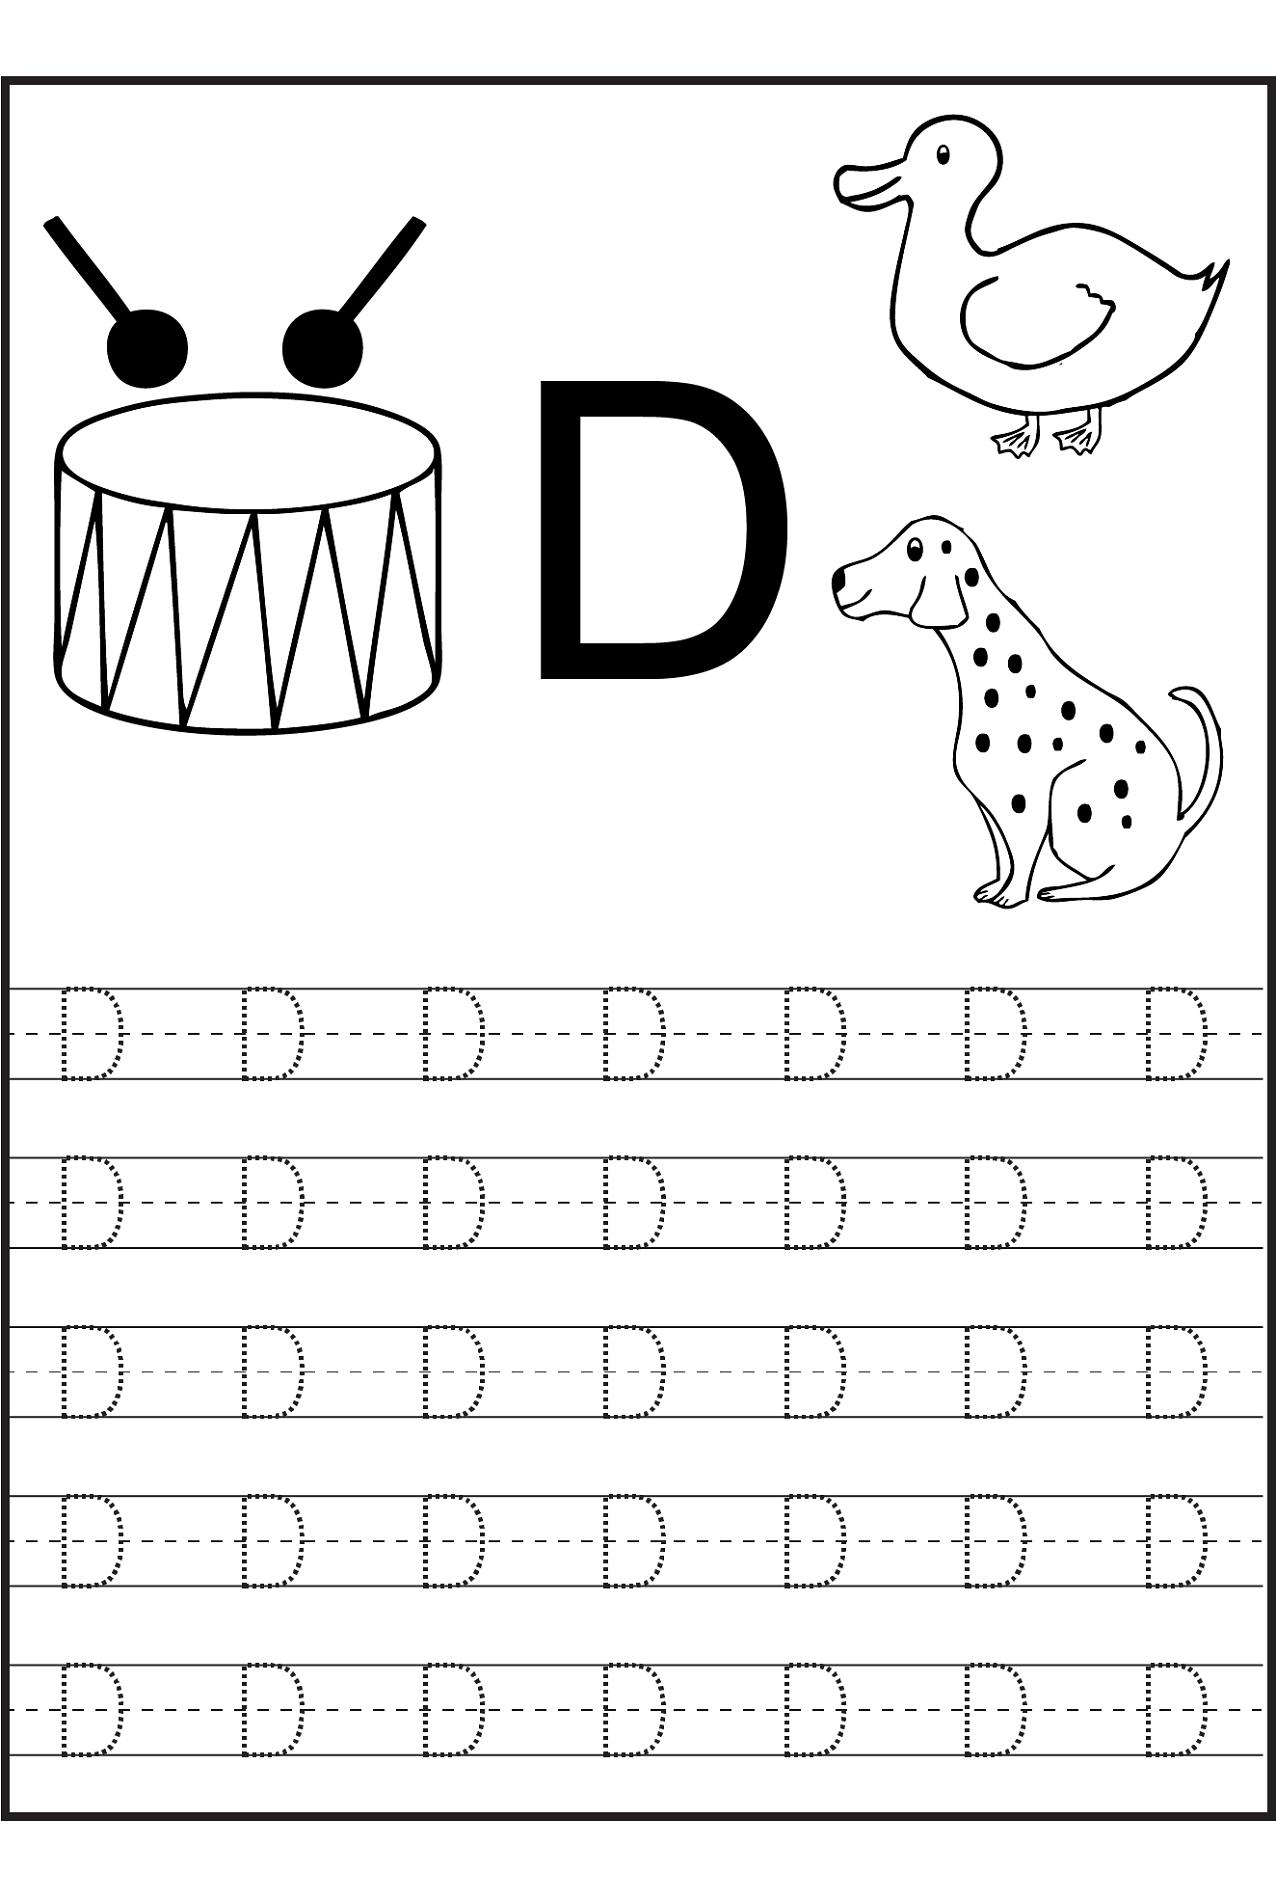 Traceable Letters Worksheet for Children Golden Age Activities – Letter D Worksheets for Kindergarten